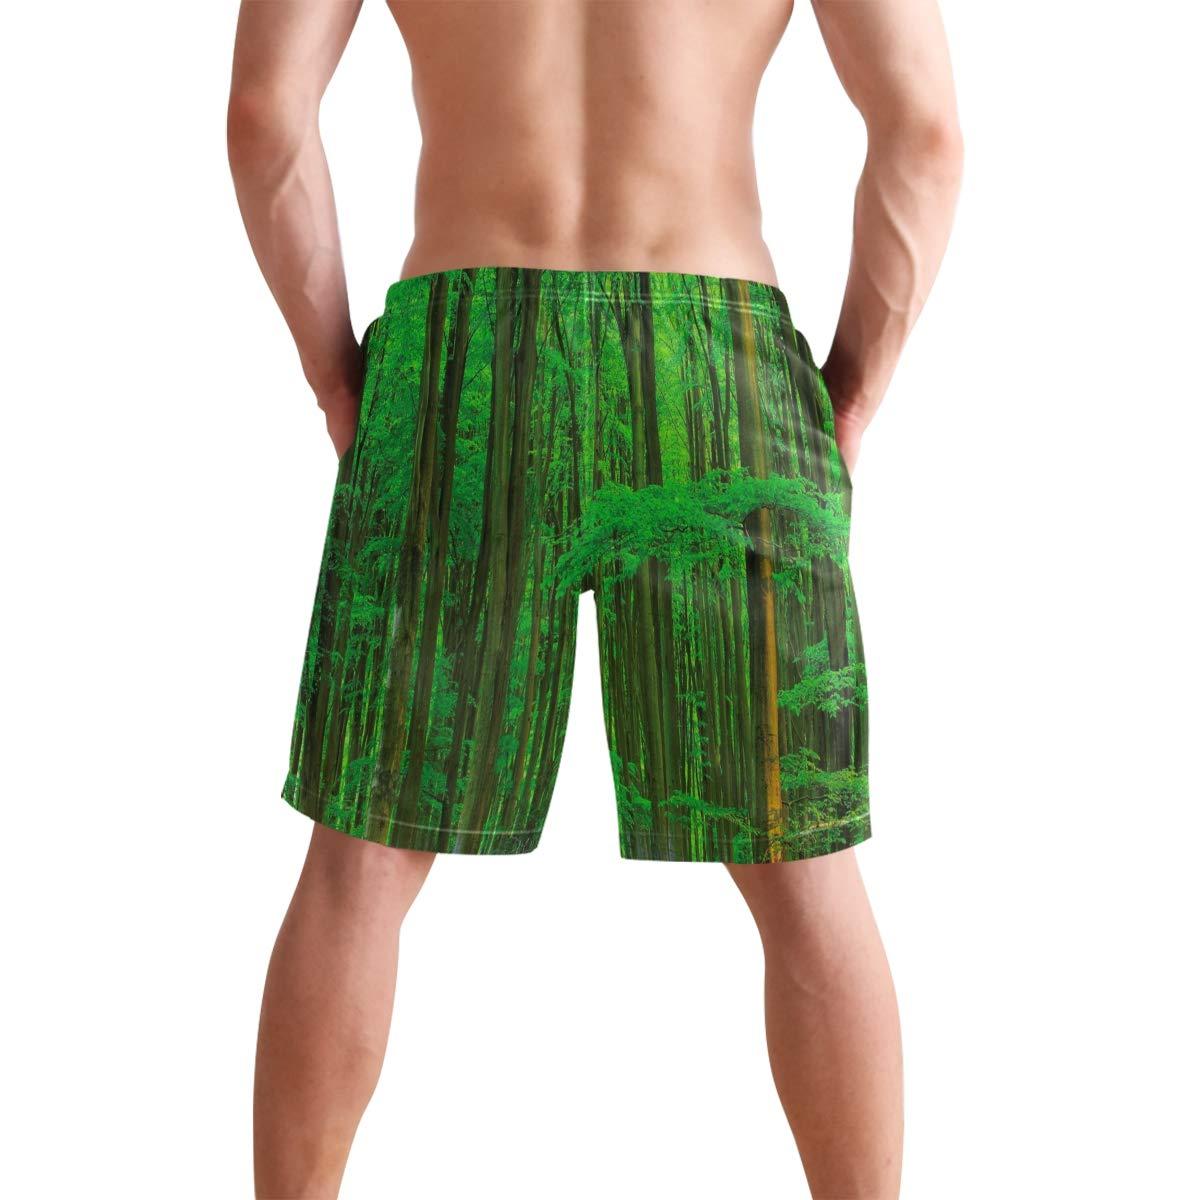 NaNa Home Bluebell Wood Summer Dream Mens Swim Board Shorts Summer Beach Short Suits